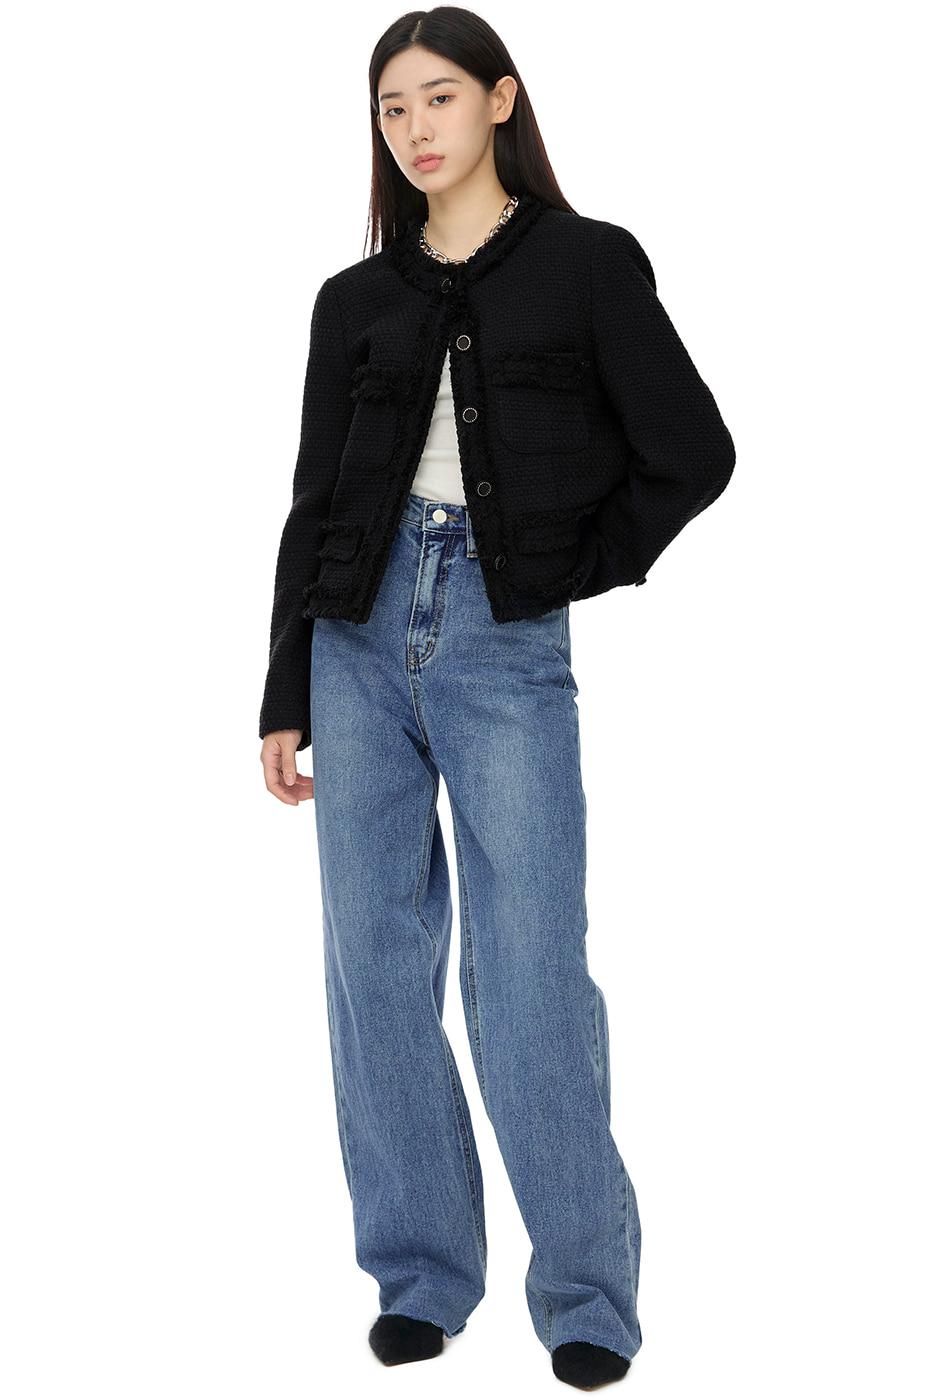 Daily Slim Modal Round Neck T-Shirt